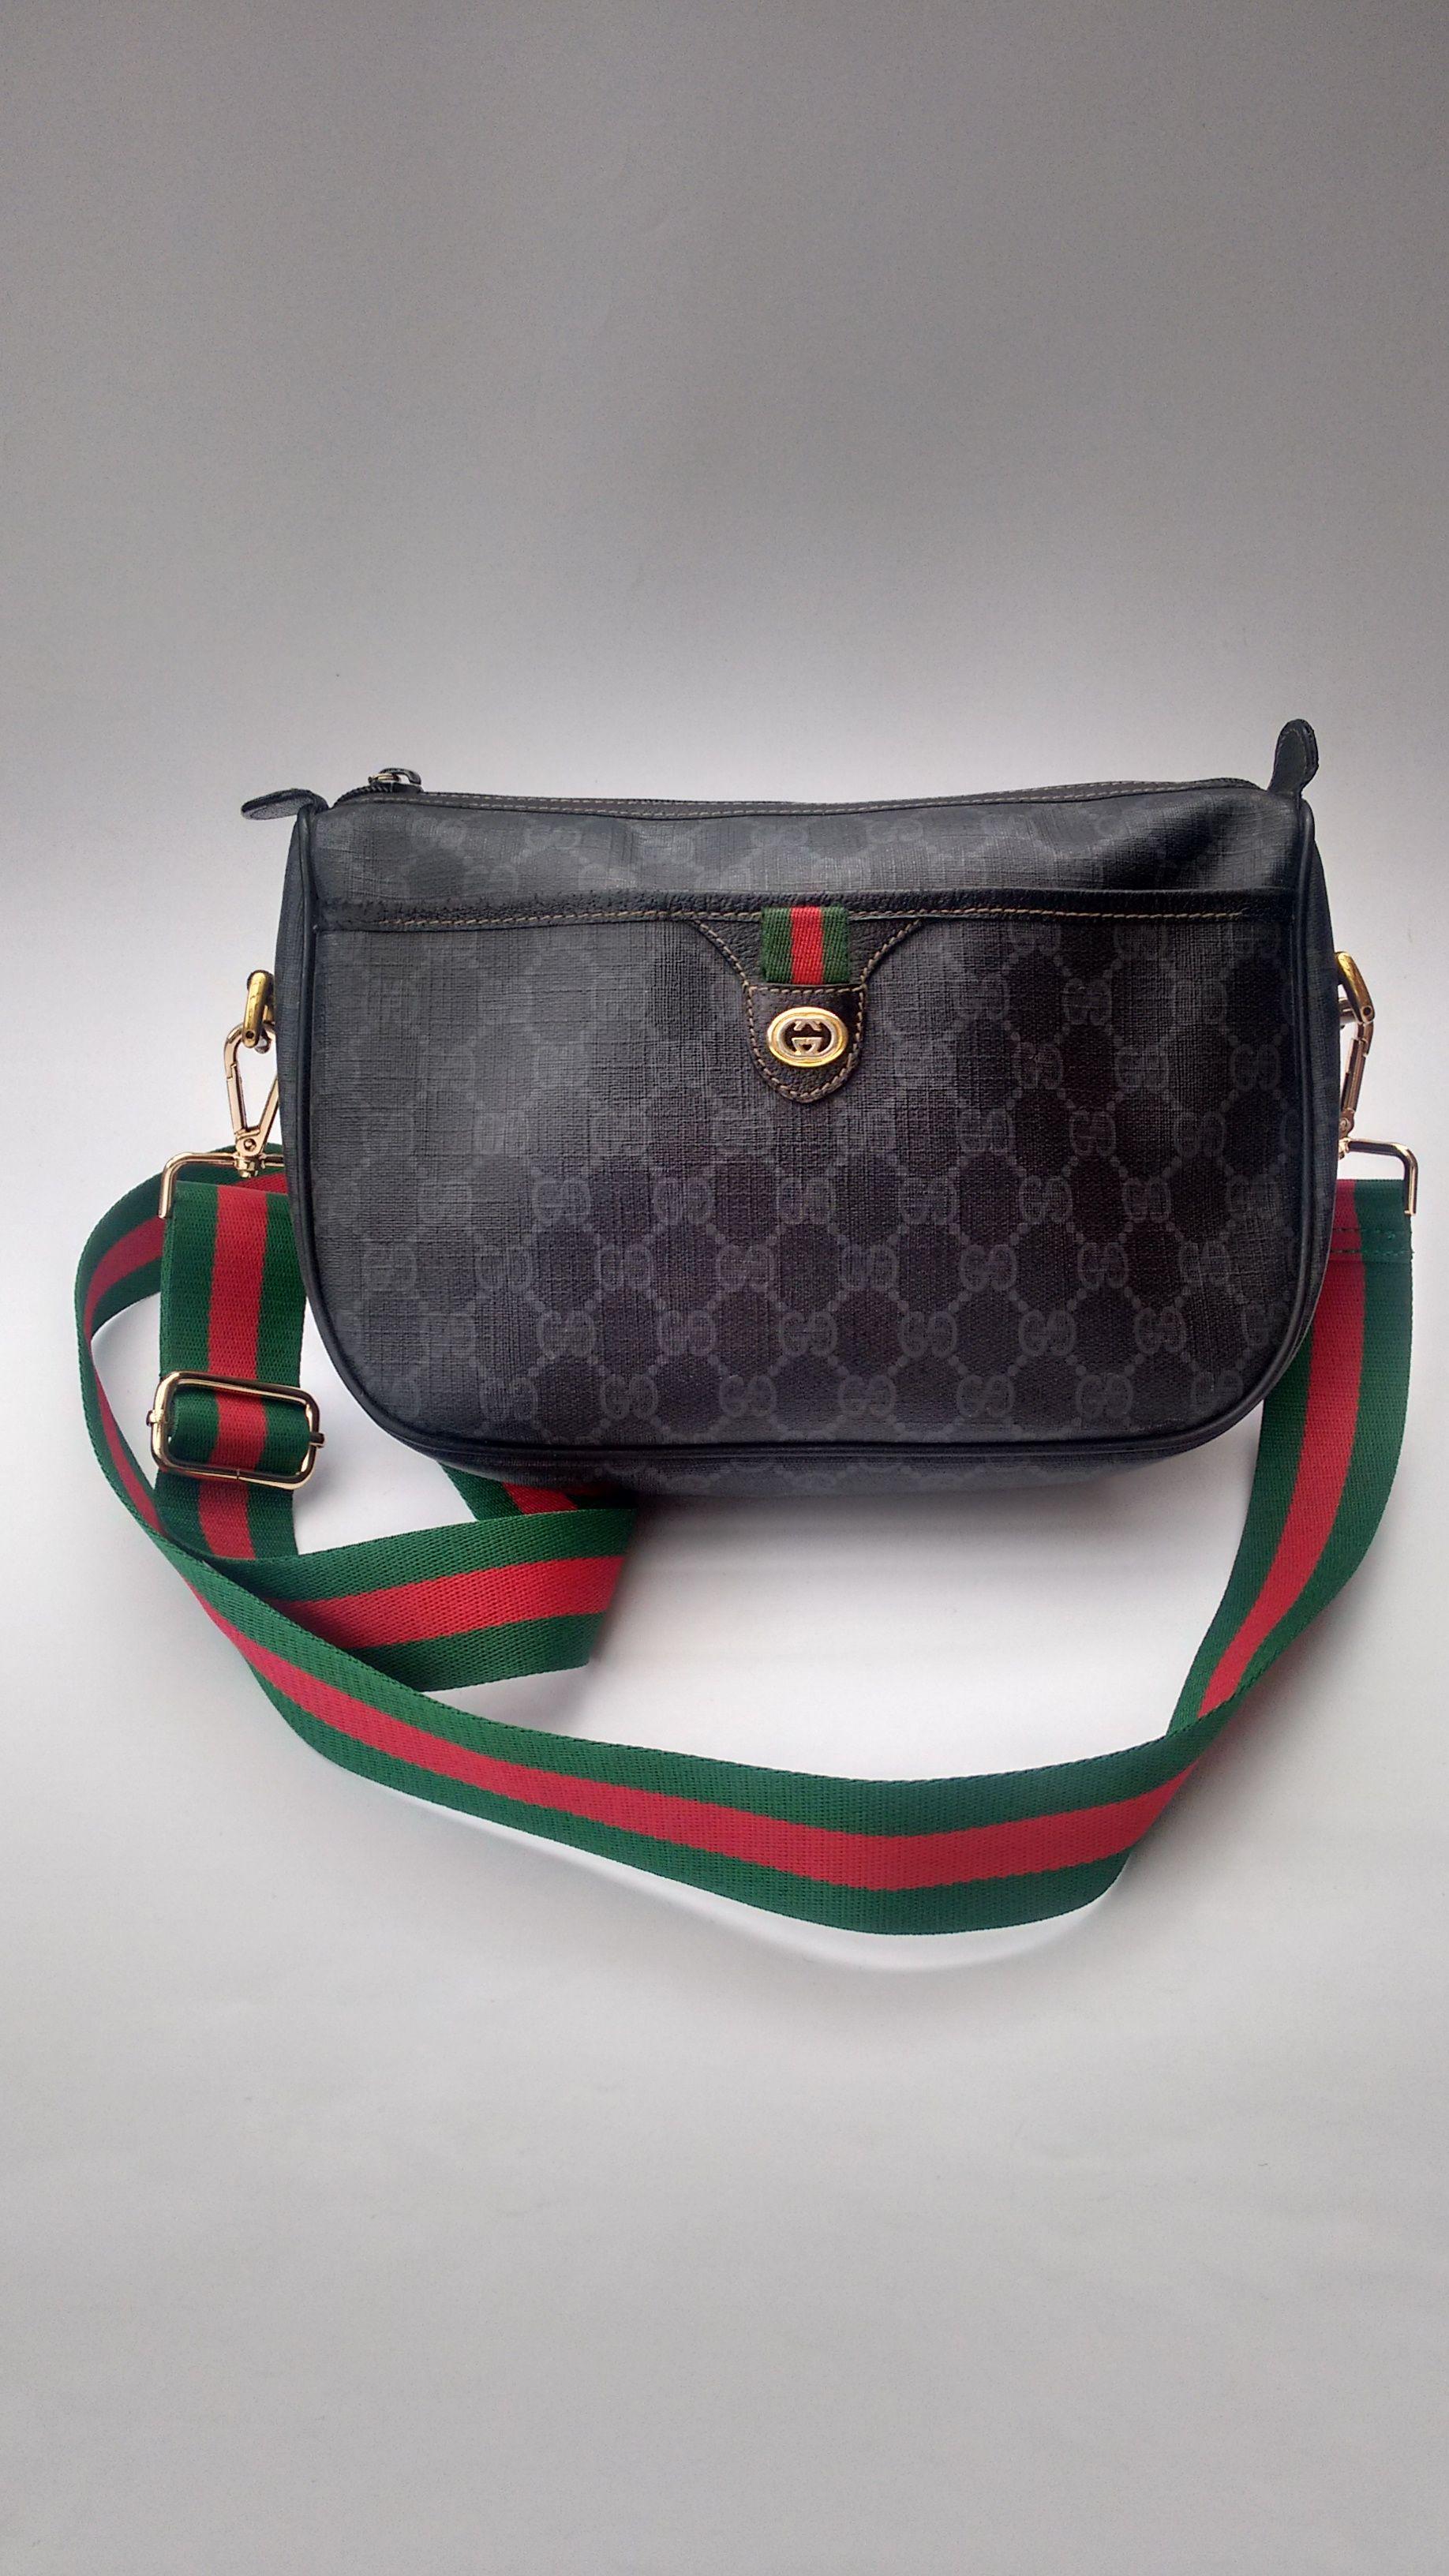 0fc2bd6c1a0c11 GUCCI Bag. Gucci Vintage Ophidia Monogram Black Web Shoulder / Crossbody Bag.  Italian Designer Bag.